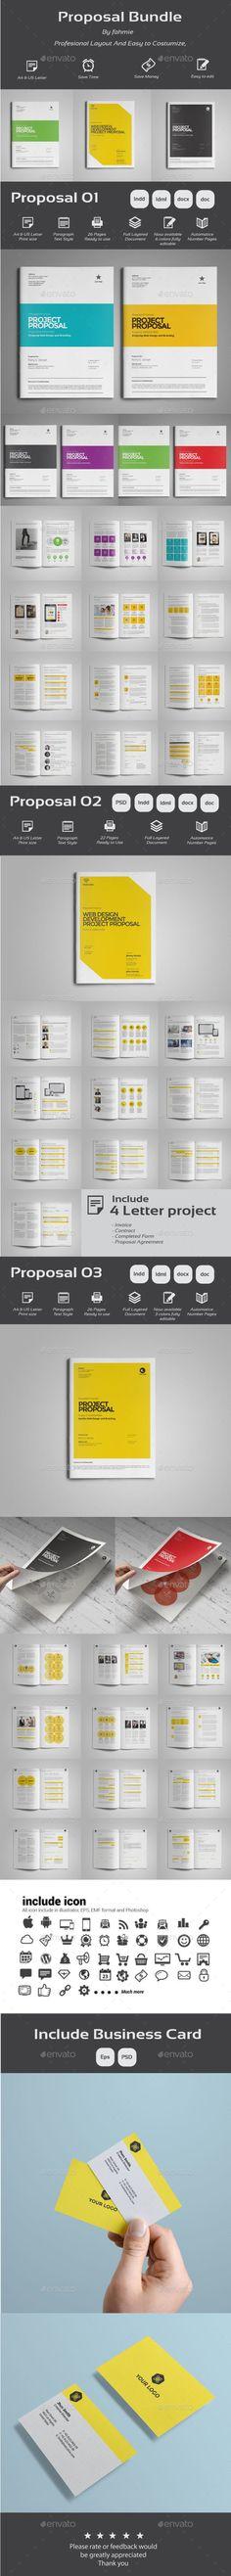 Proposal Bundle Templates #design Download: http://graphicriver.net/item/proposal-bundle/13918986?ref=ksioks